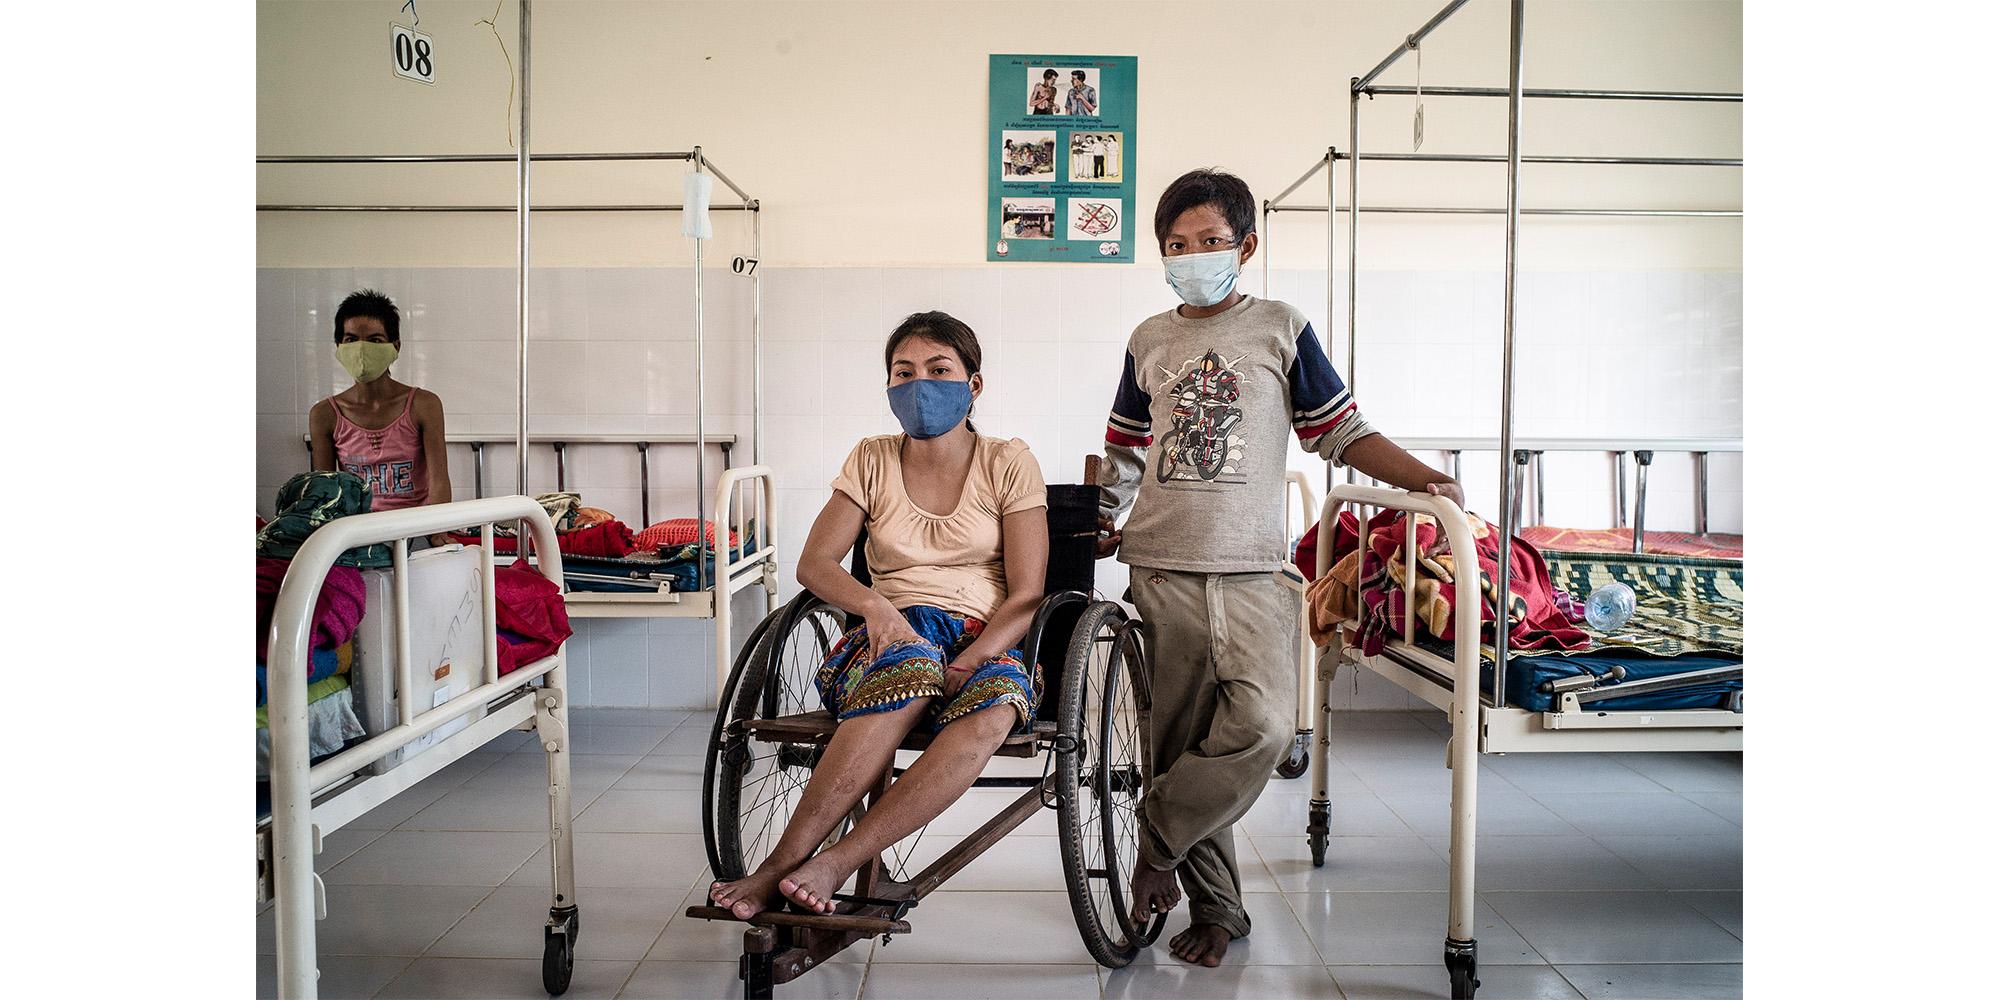 MDR TB & HIV, Cambodia (Narrative) / Medicines Sans Frontieres